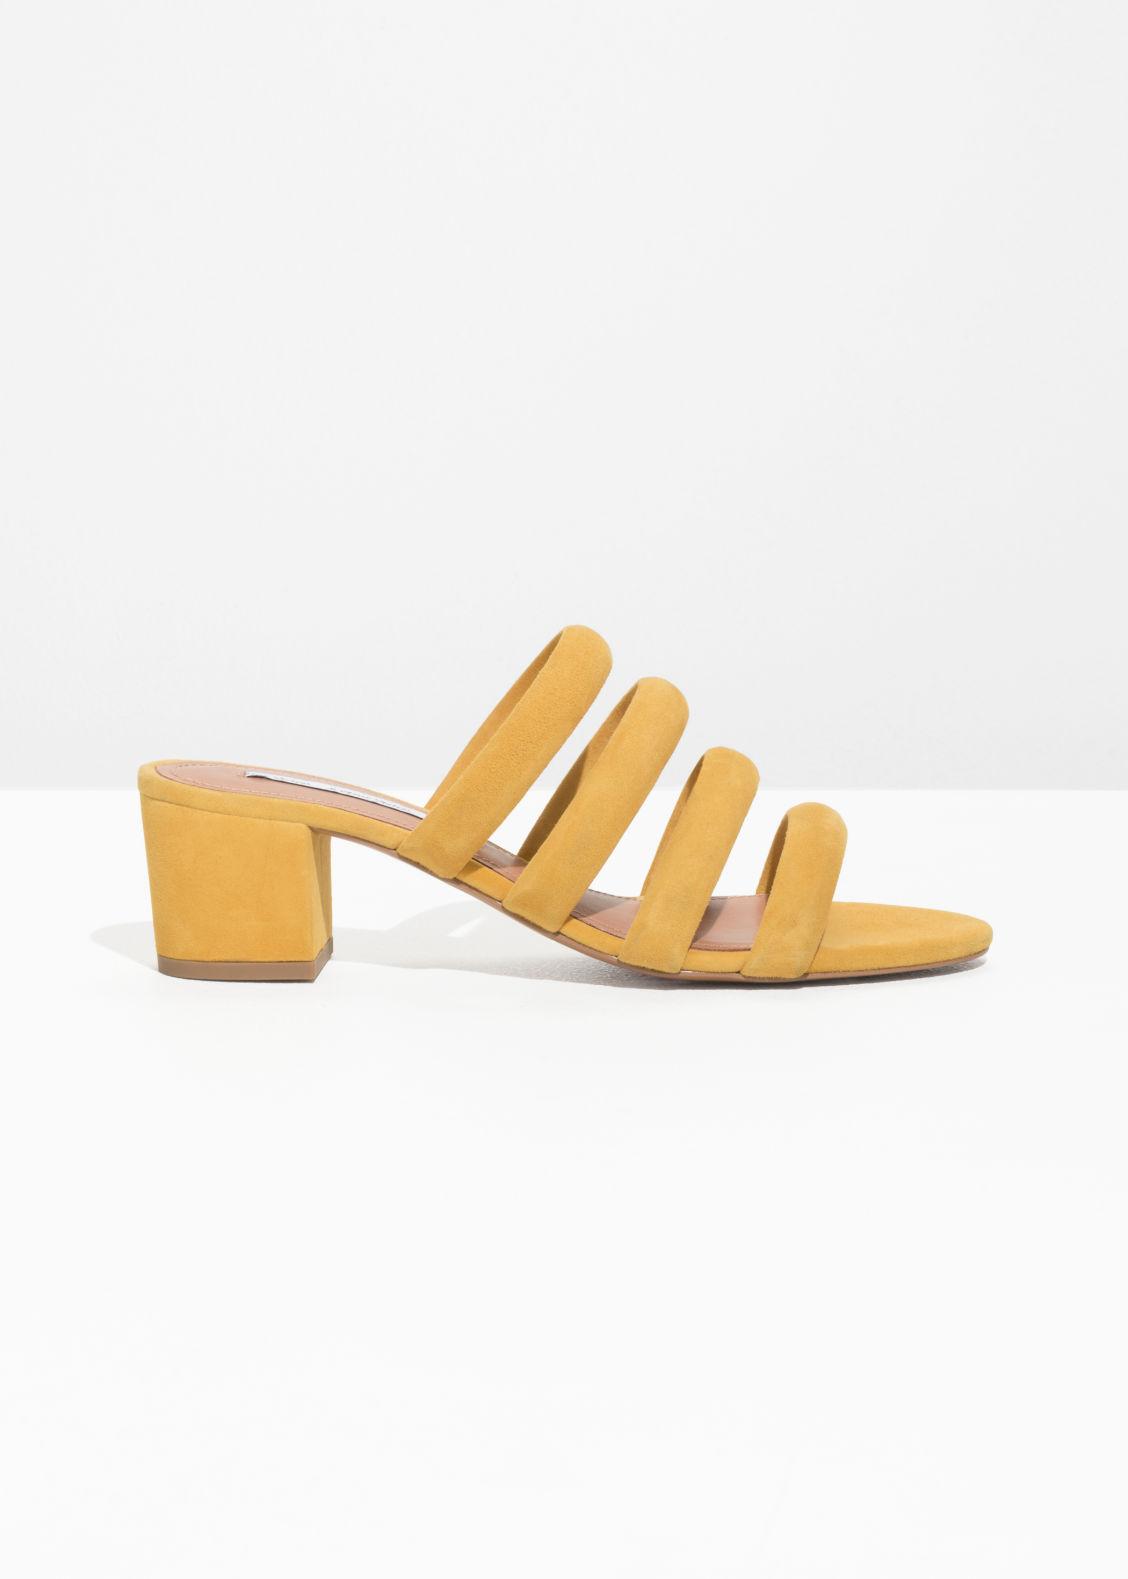 Venta con tarjeta de crédito & OTHER STORIES Heeled Suede Four Strap Sandal - Yellow Footlocker Finishline Proveedor más grande en línea barato Manchester en línea OagwyYGizA